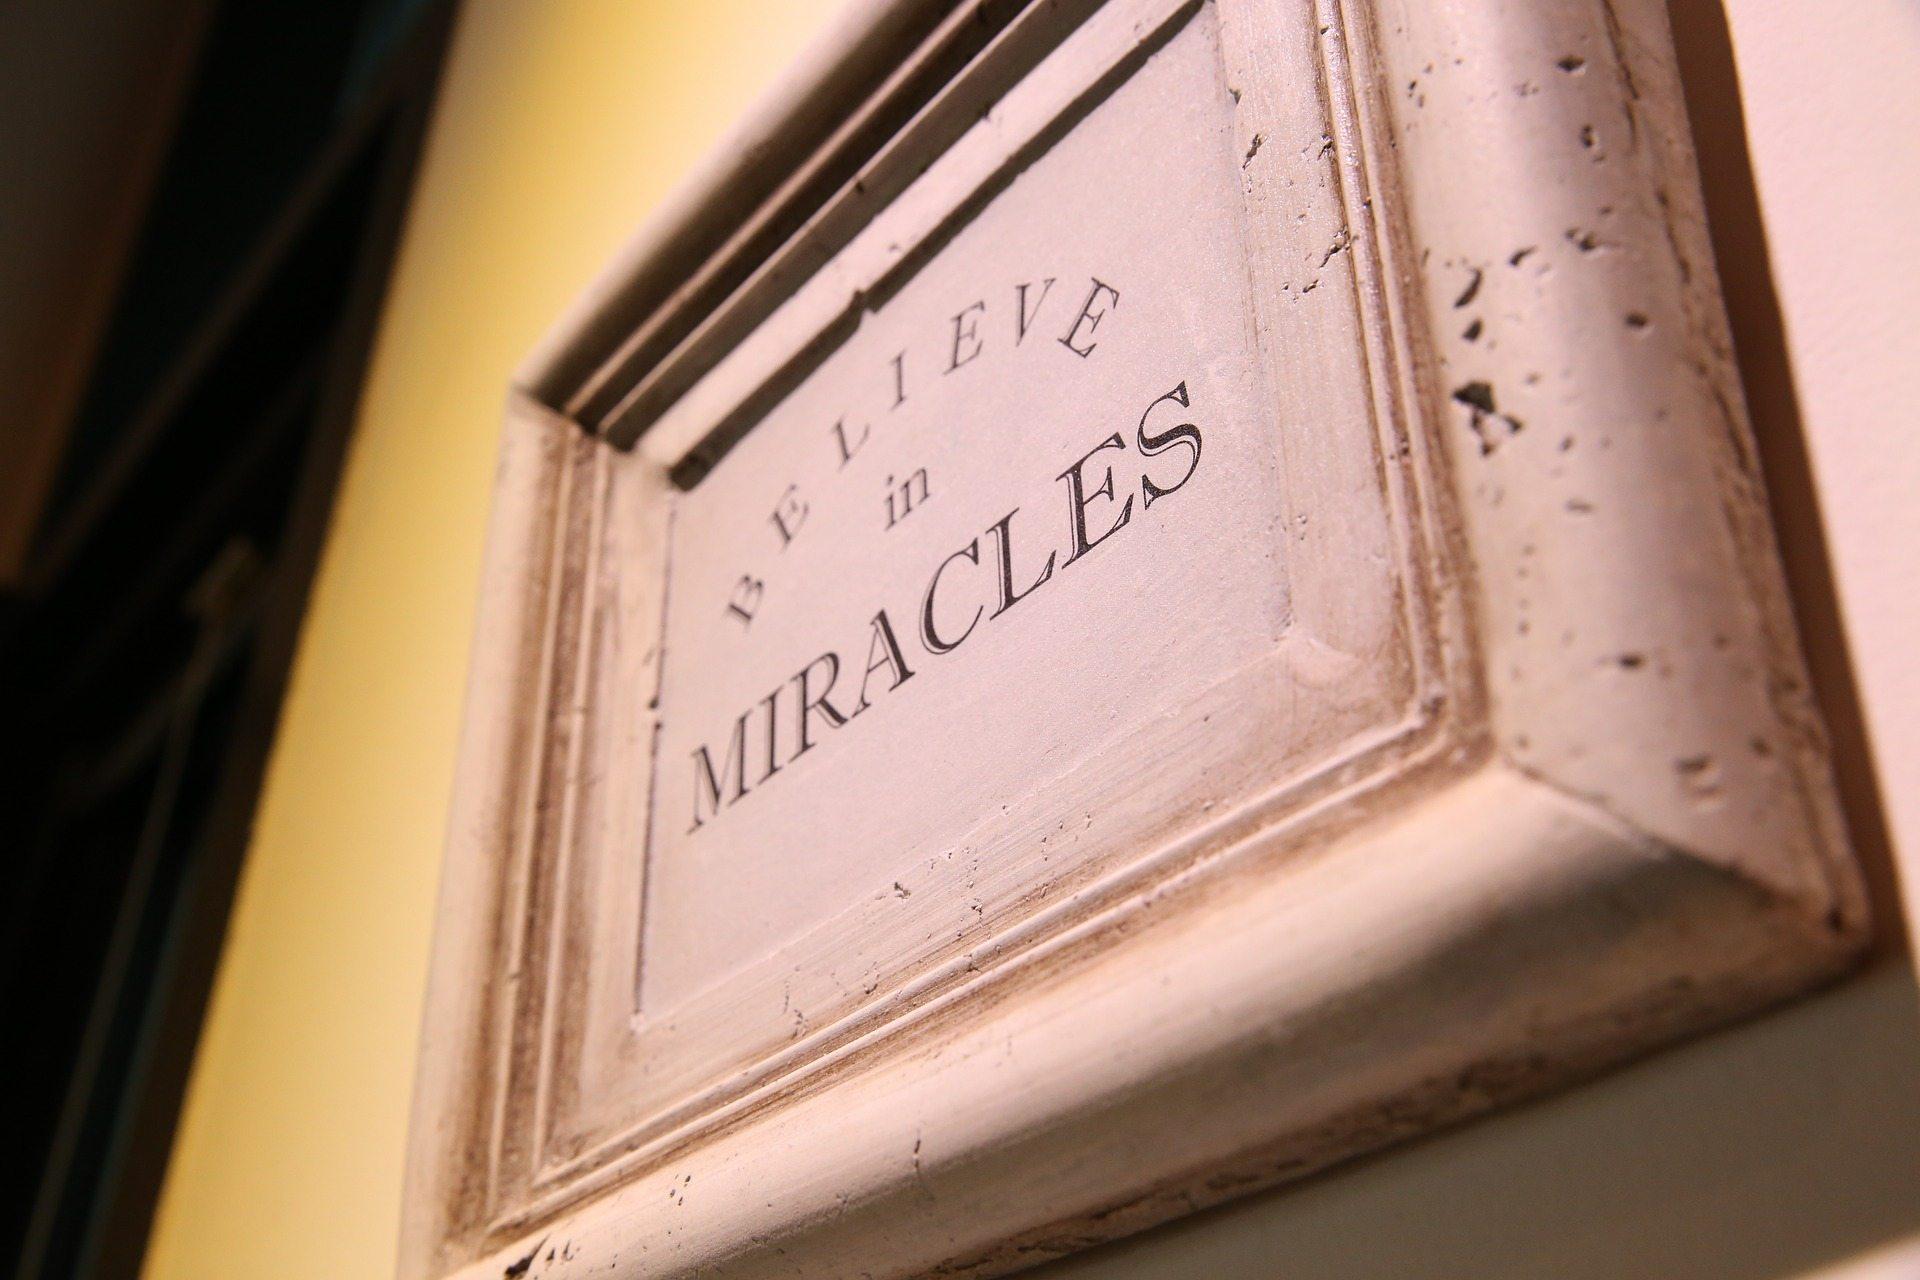 Marriage miracle-364681_1920 - Pixabay